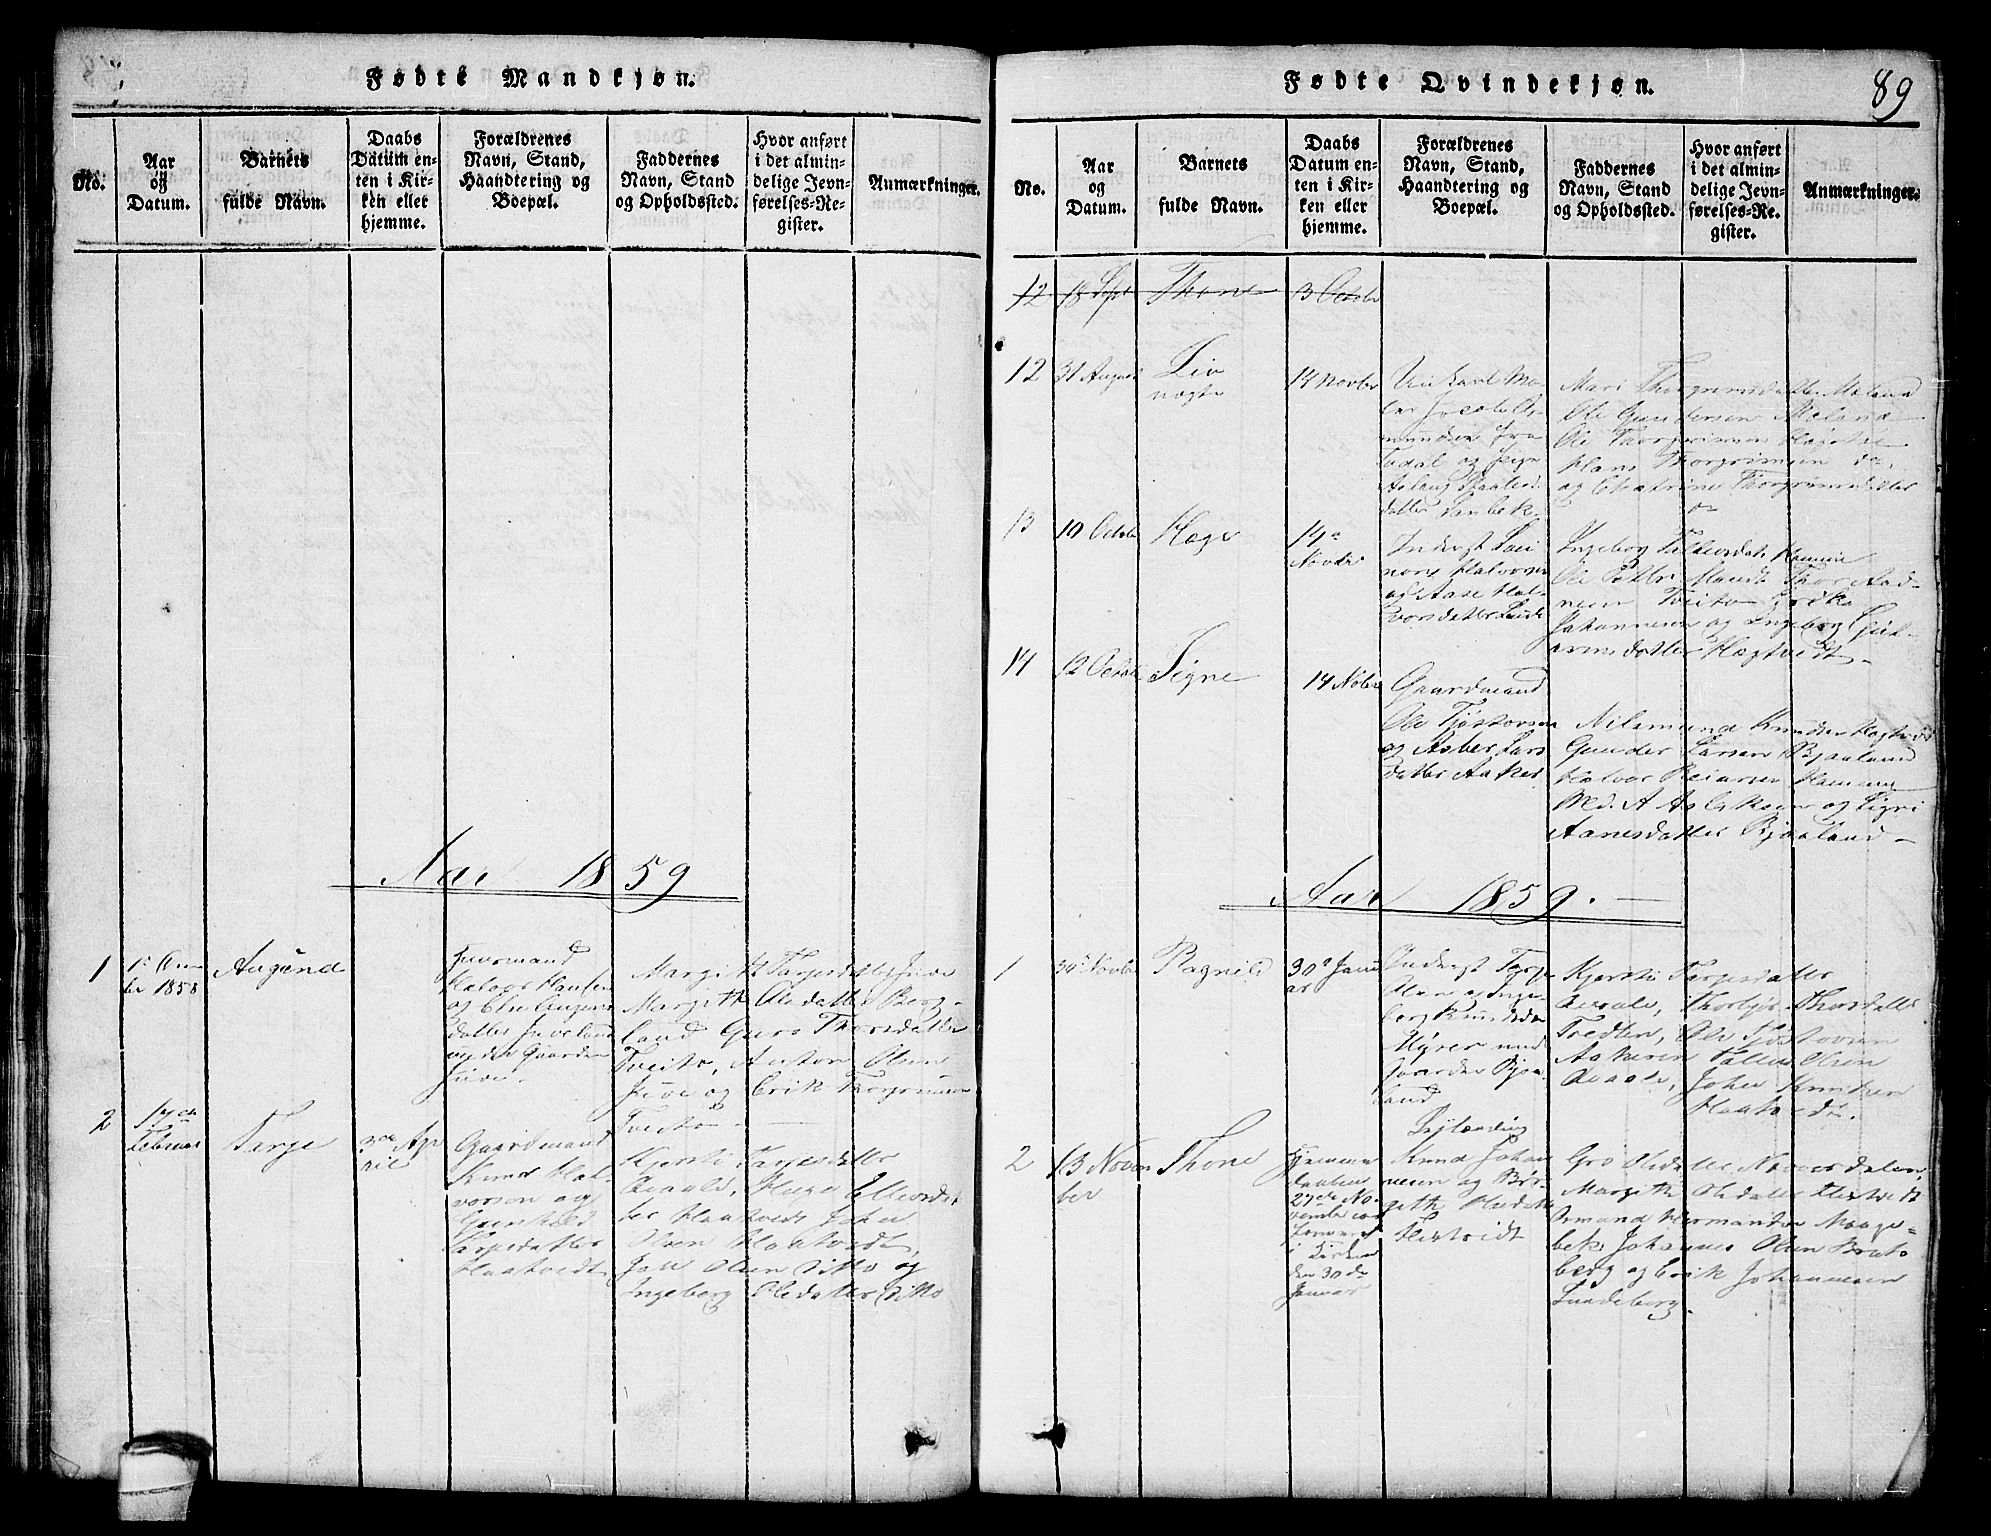 SAKO, Lårdal kirkebøker, G/Ga/L0001: Klokkerbok nr. I 1, 1815-1861, s. 89